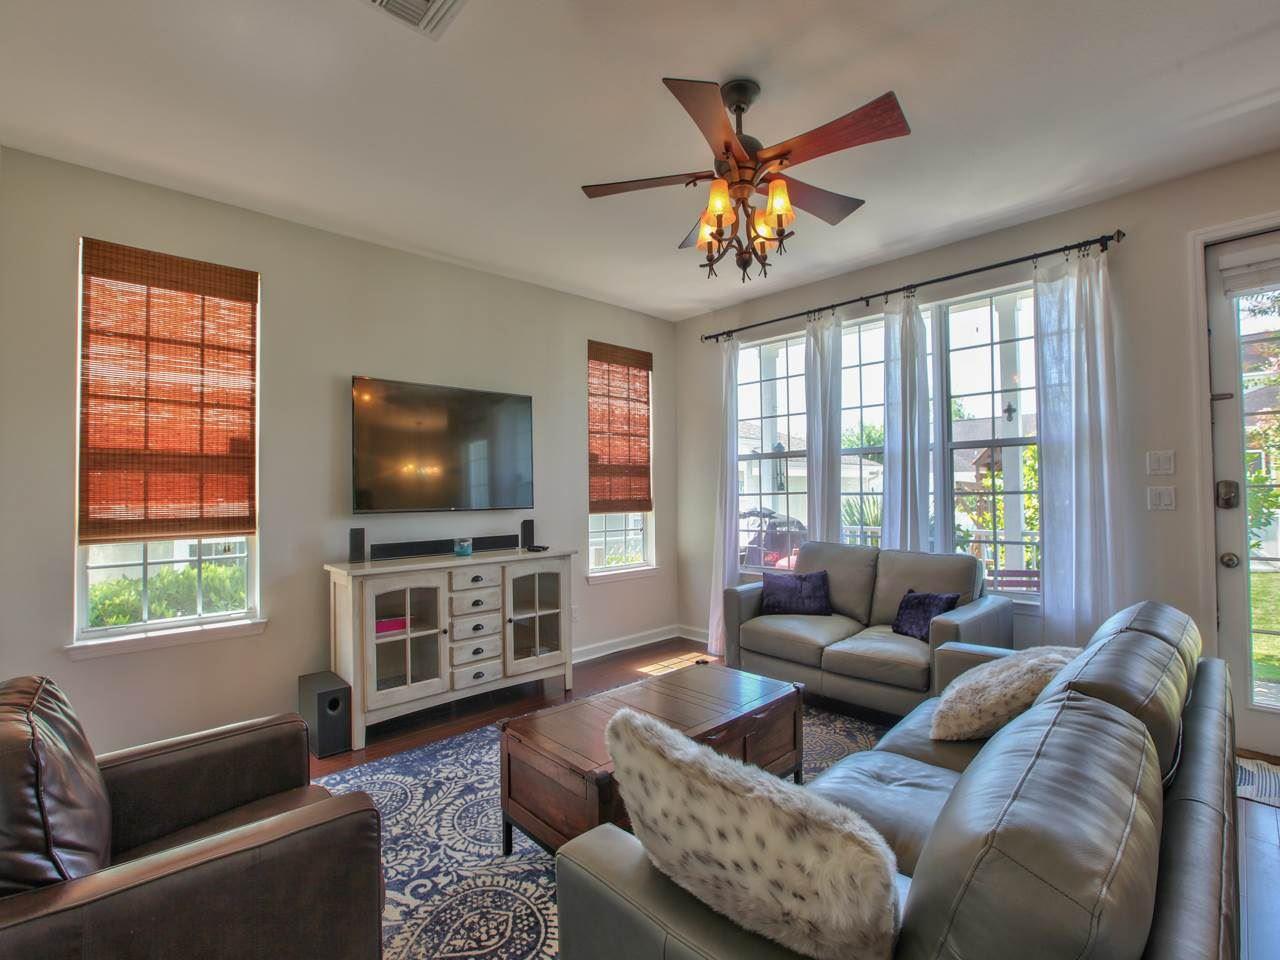 Photo of 2103 MERRIFIELD Lane, TALLAHASSEE, FL 32311 (MLS # 321914)